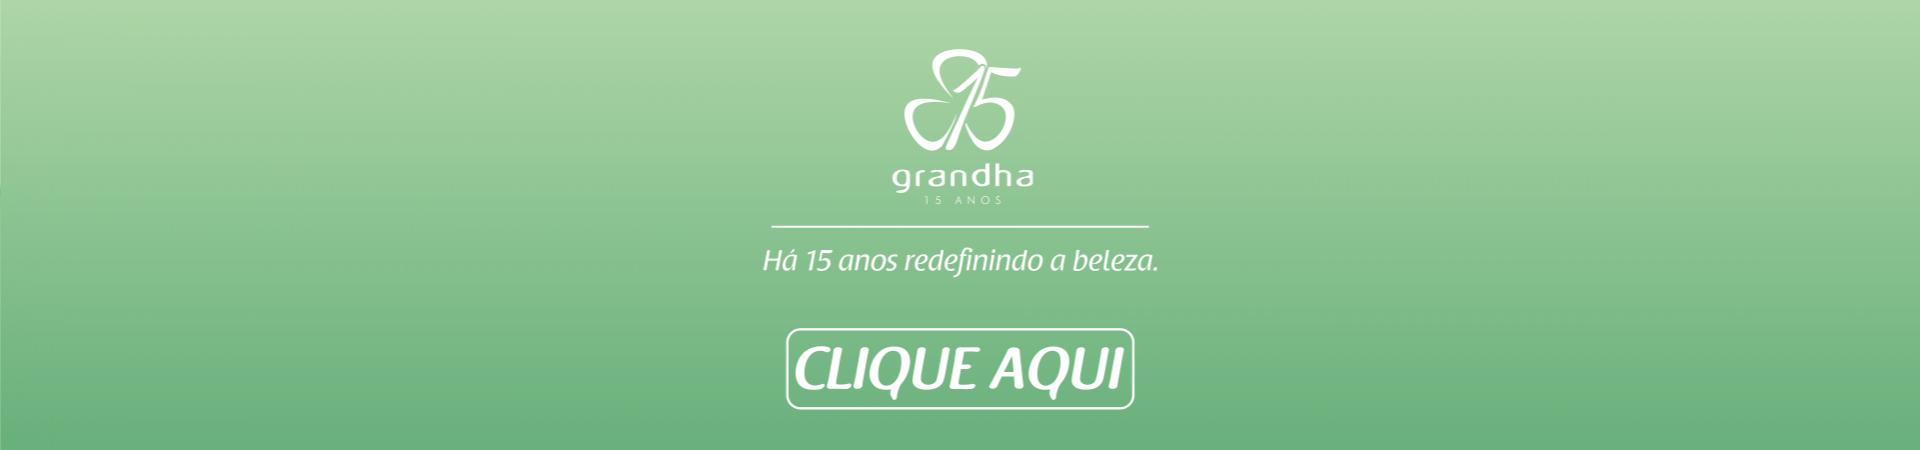 Grandha - Há 15 anos Redefinindo a Beleza